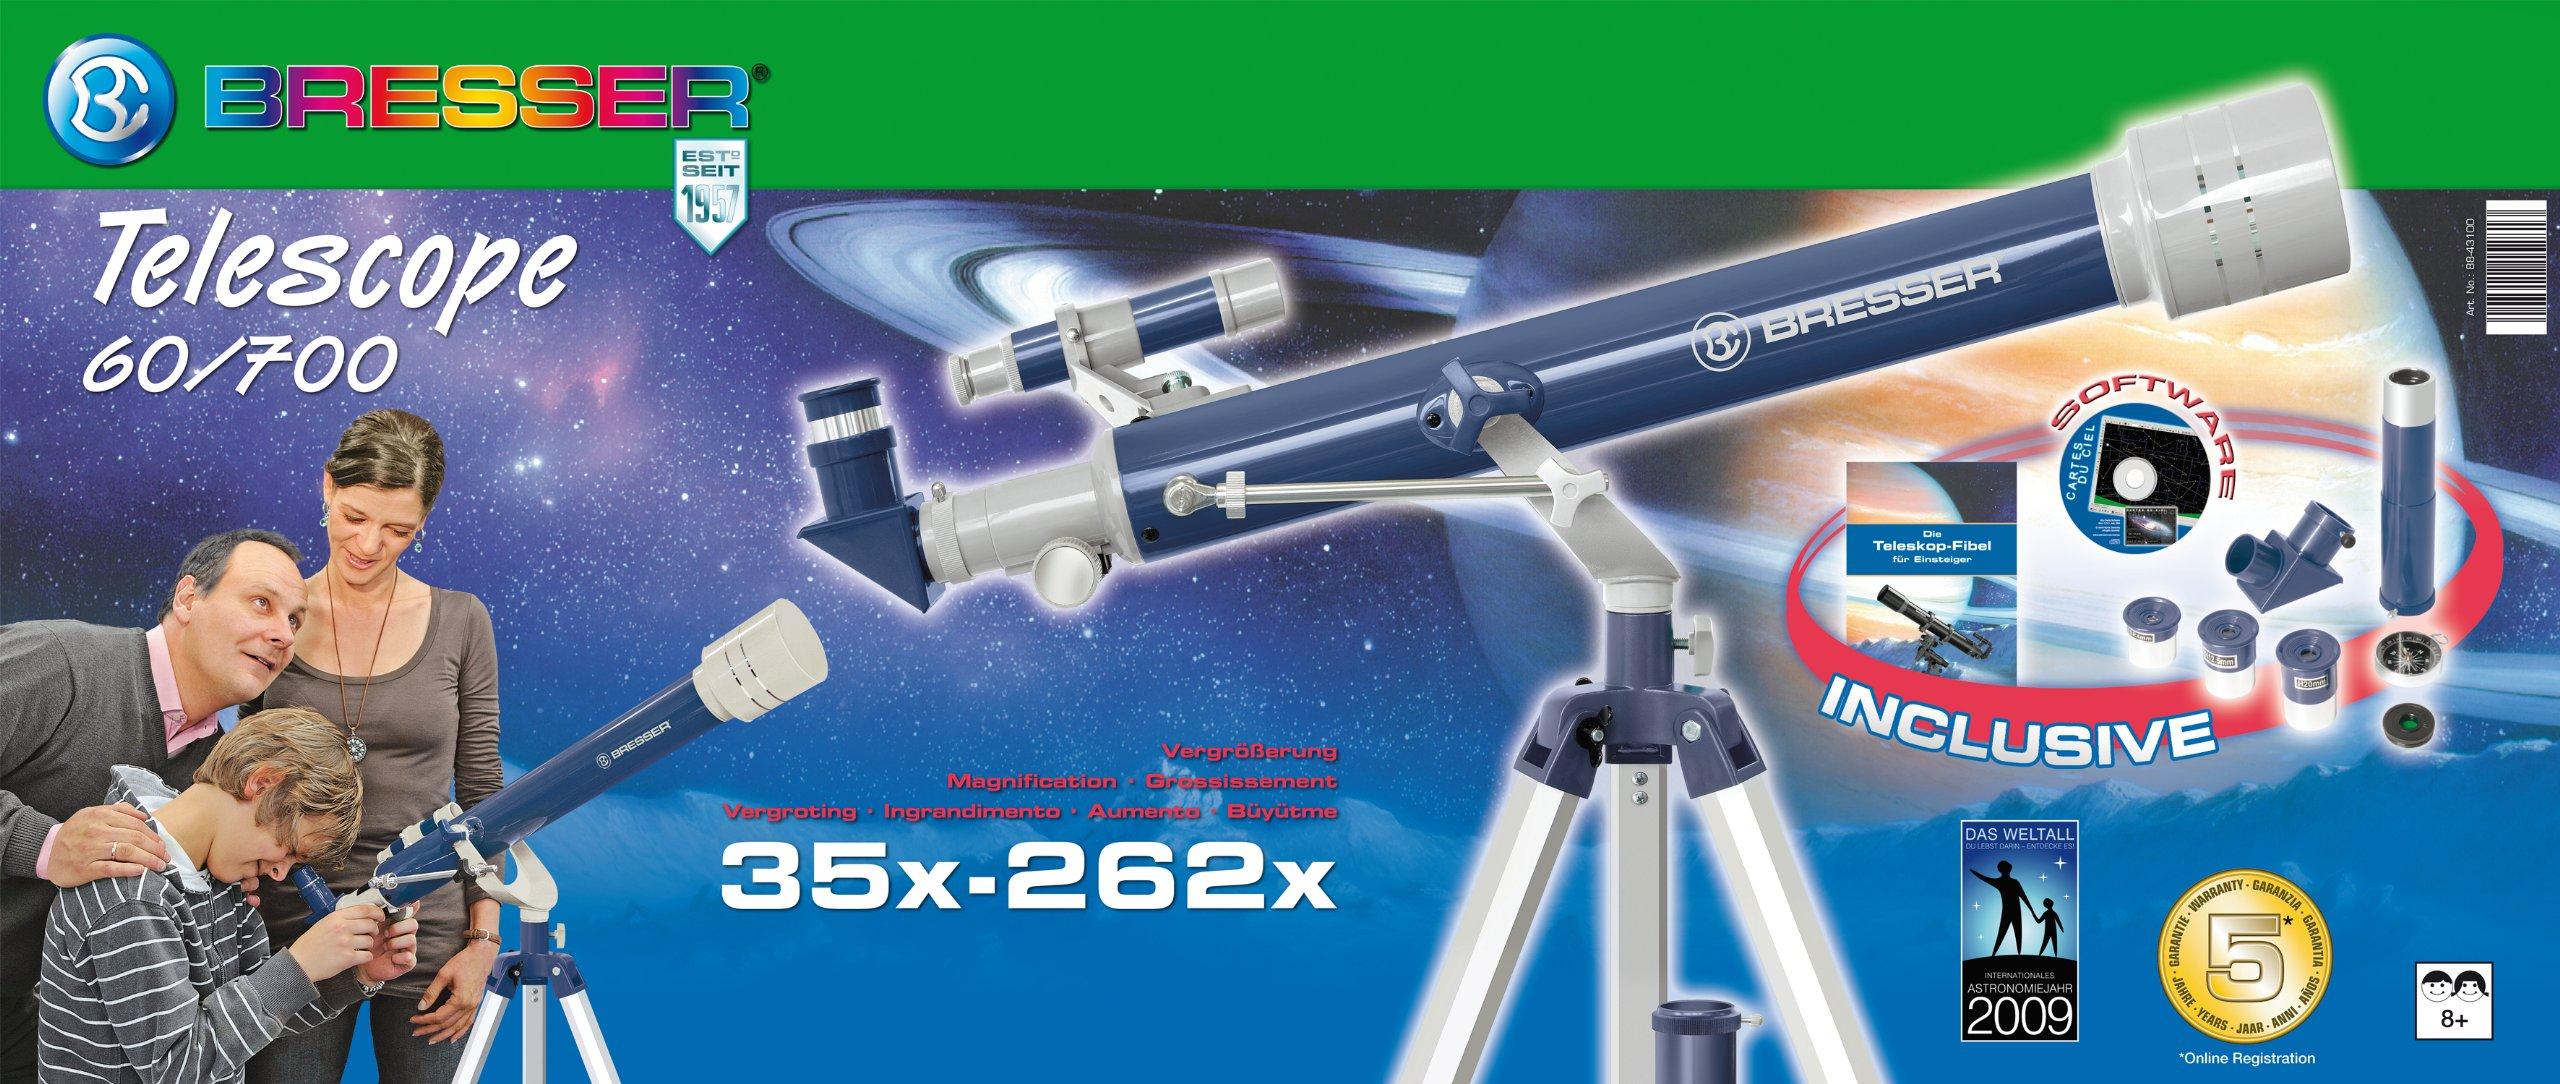 Bresser Junior Telescope 60/700 AZ Refractor Telescope - Blue/Grey